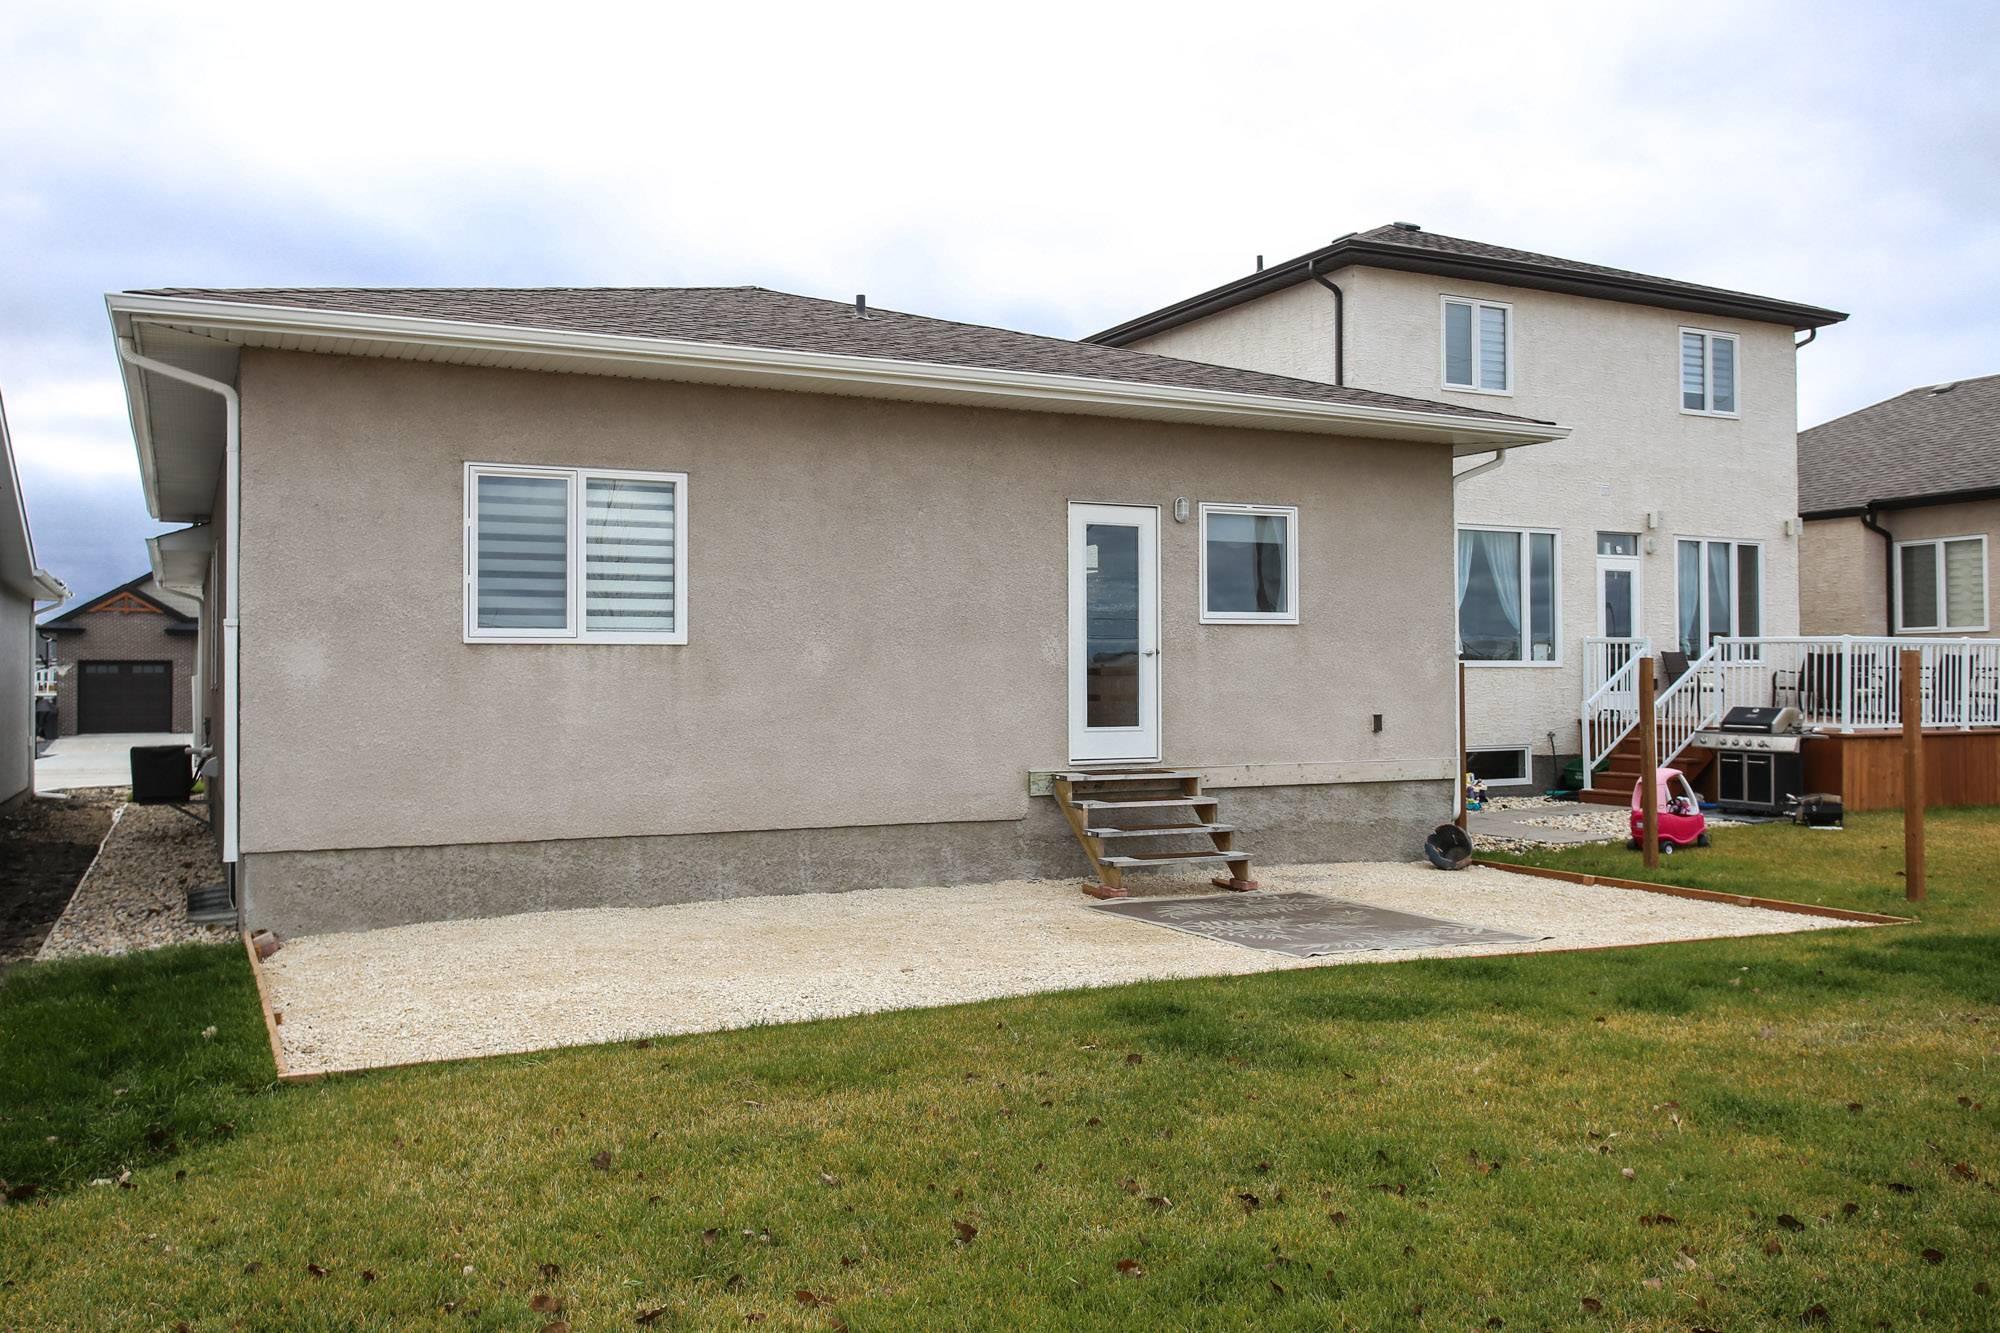 134 Phillip Lee Drive, Winnipeg, Manitoba  R3W 1P9 - Photo 26 - 1831033